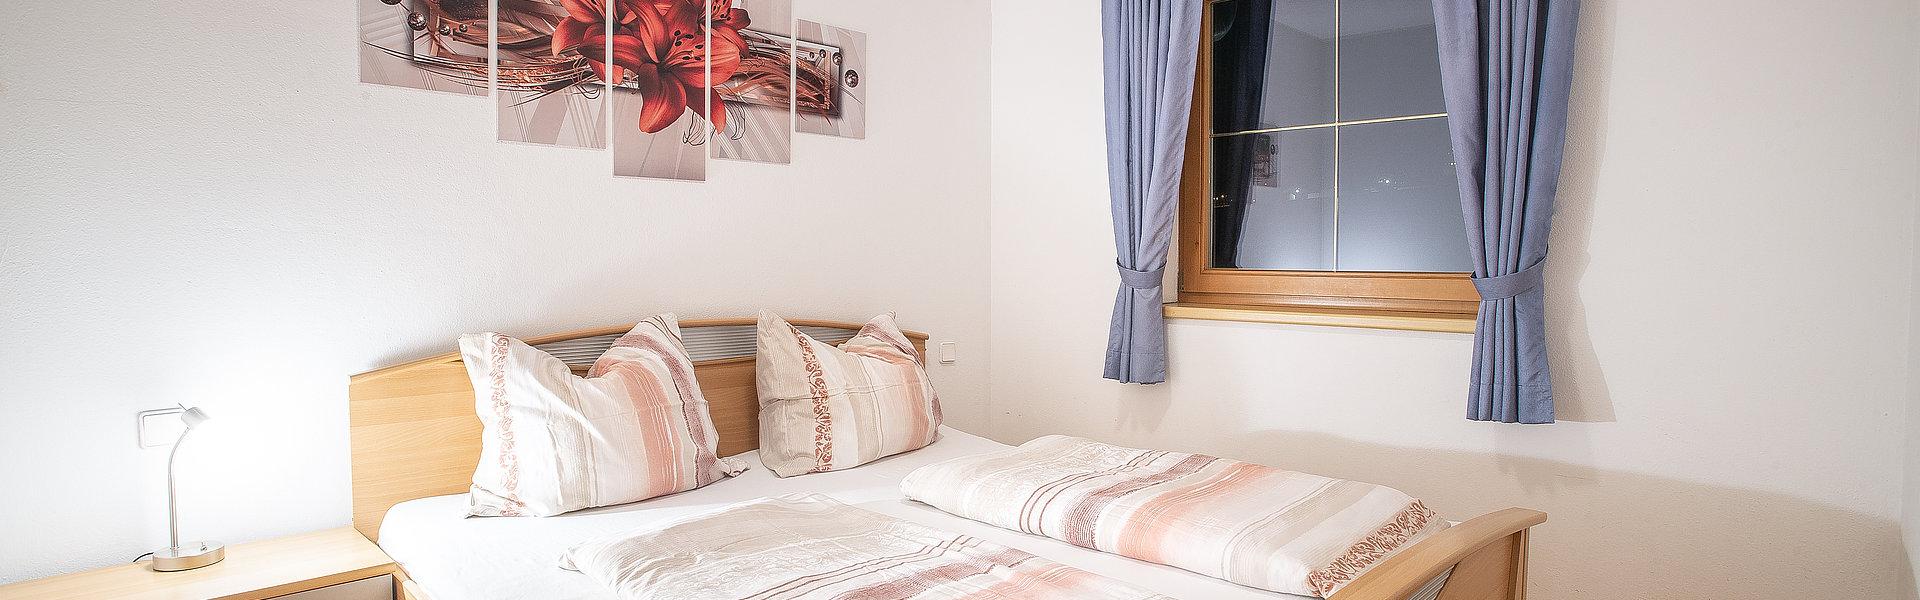 Apartment Rofanblick - Camping Inntal